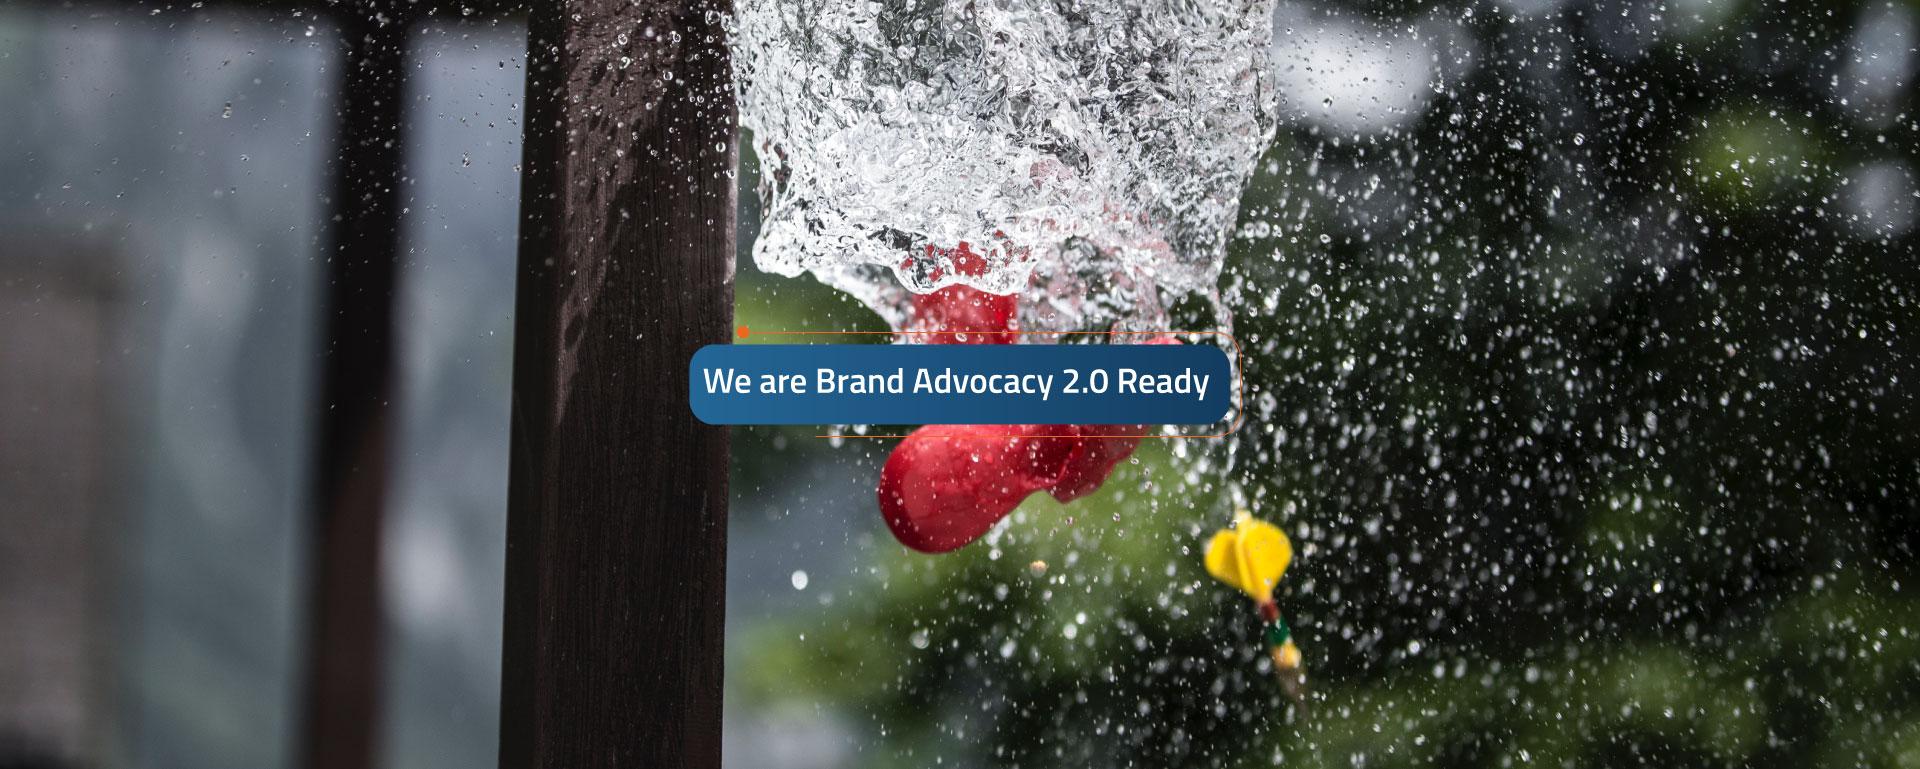 Brand Advocacy 2.0